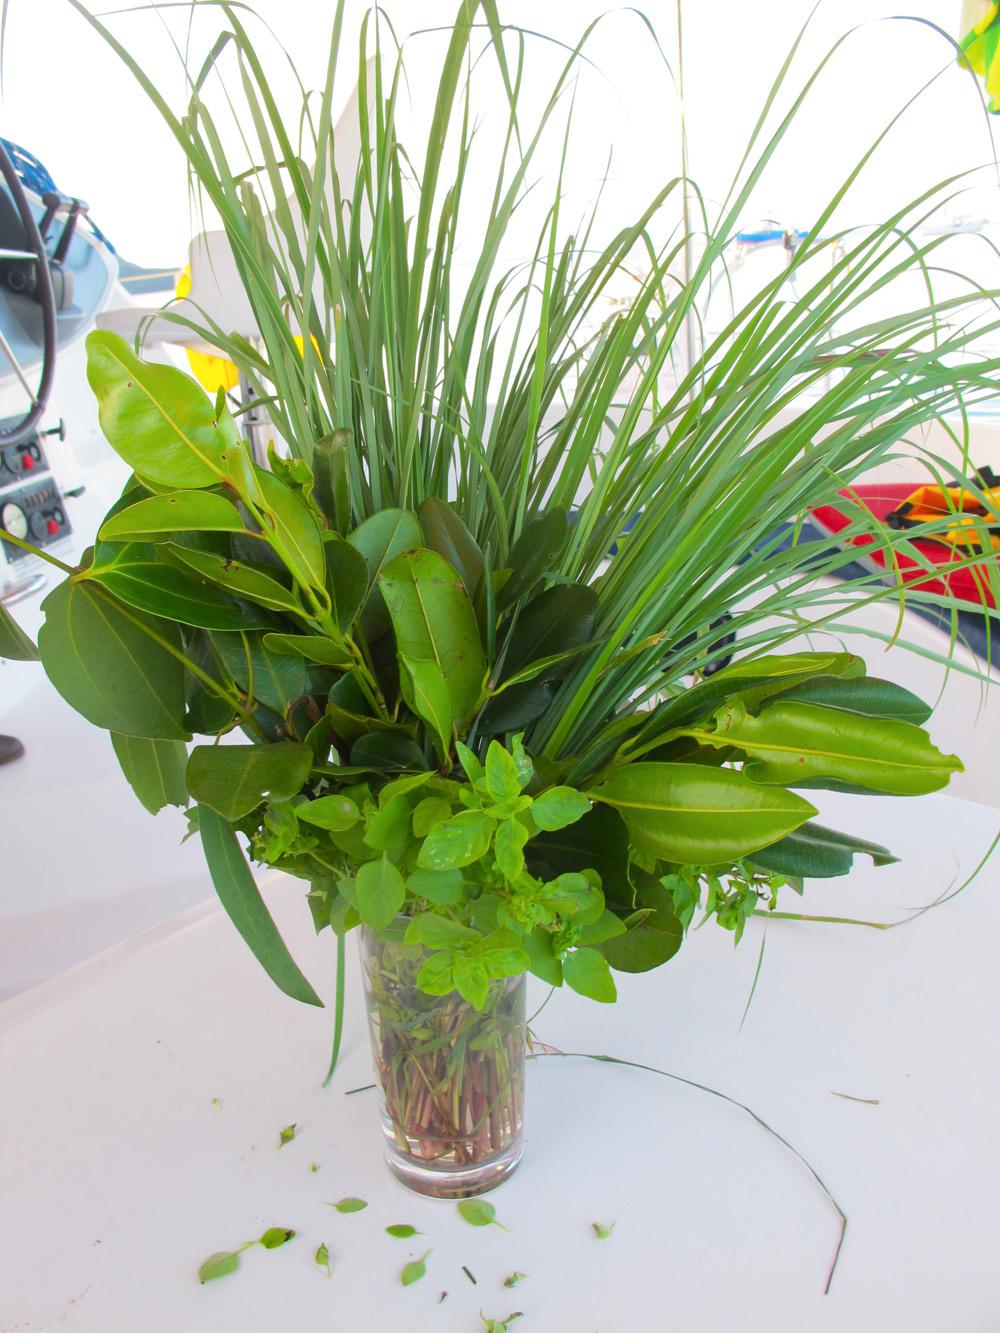 my wonderful wild herbs courtesy of Uncle Sam